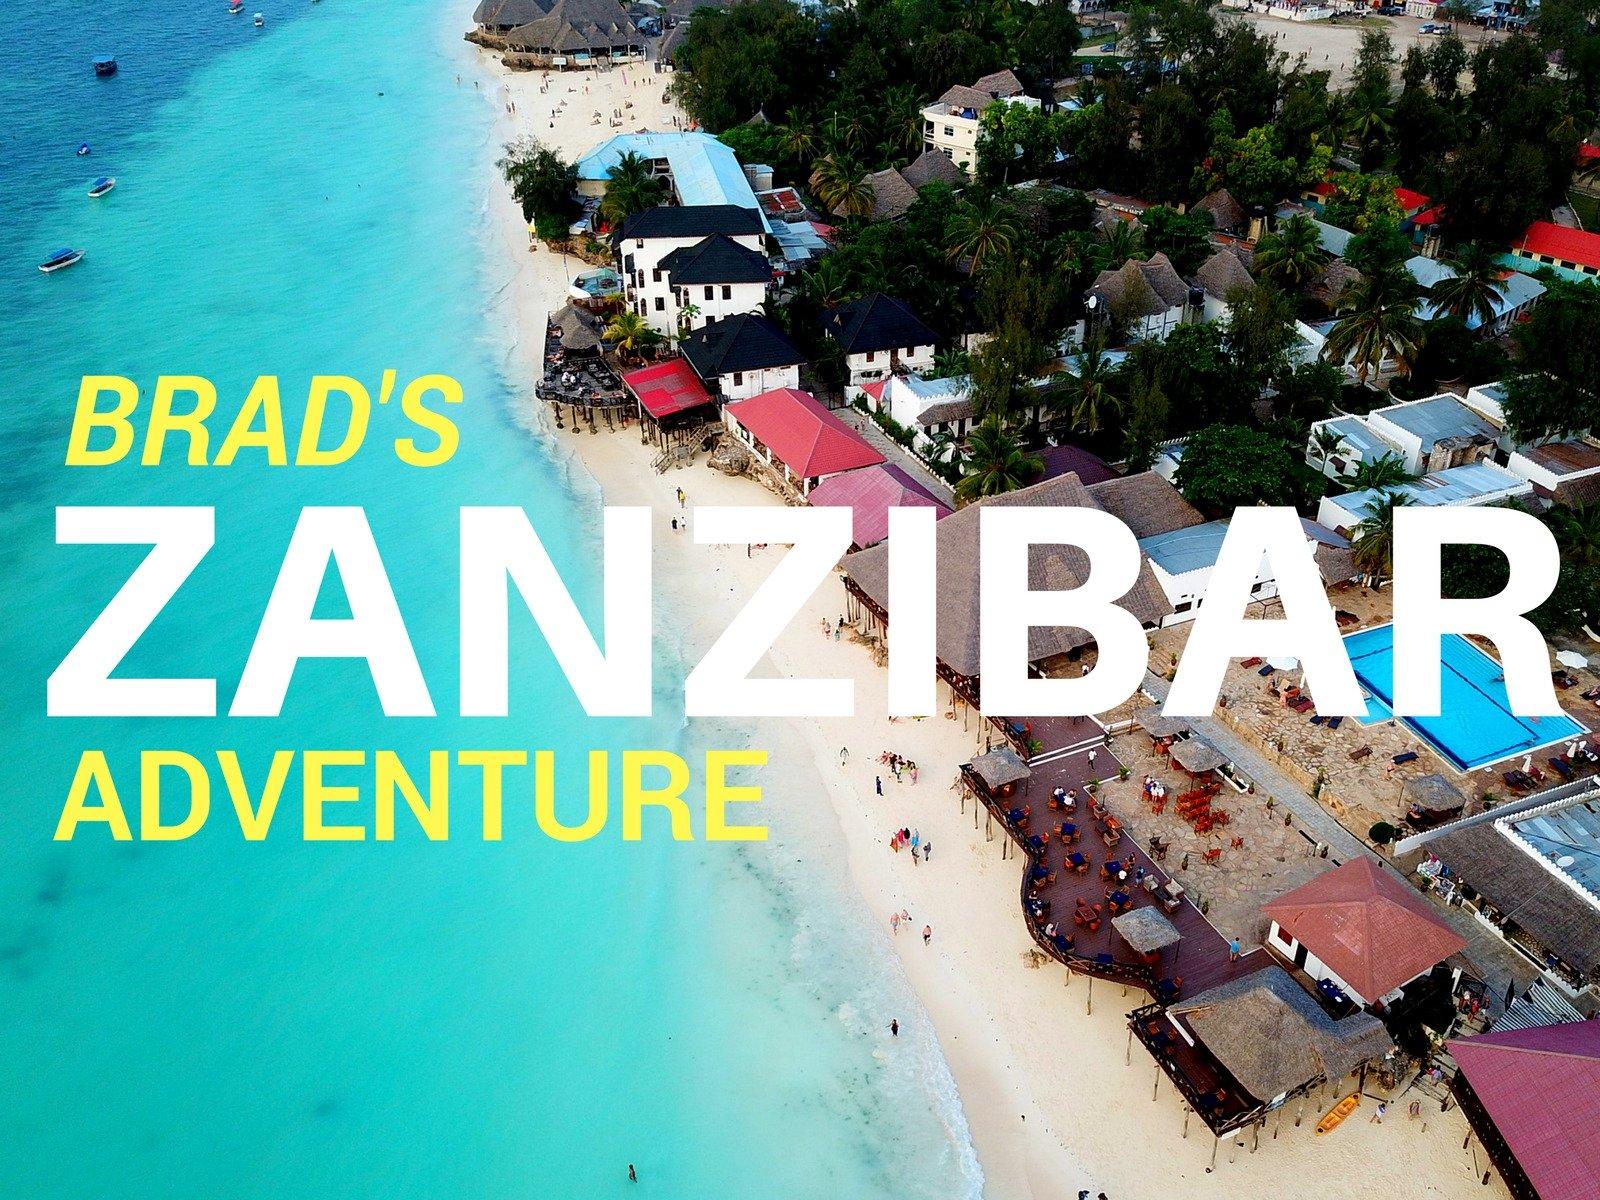 Brad's Zanzibar Adventure - Season 1